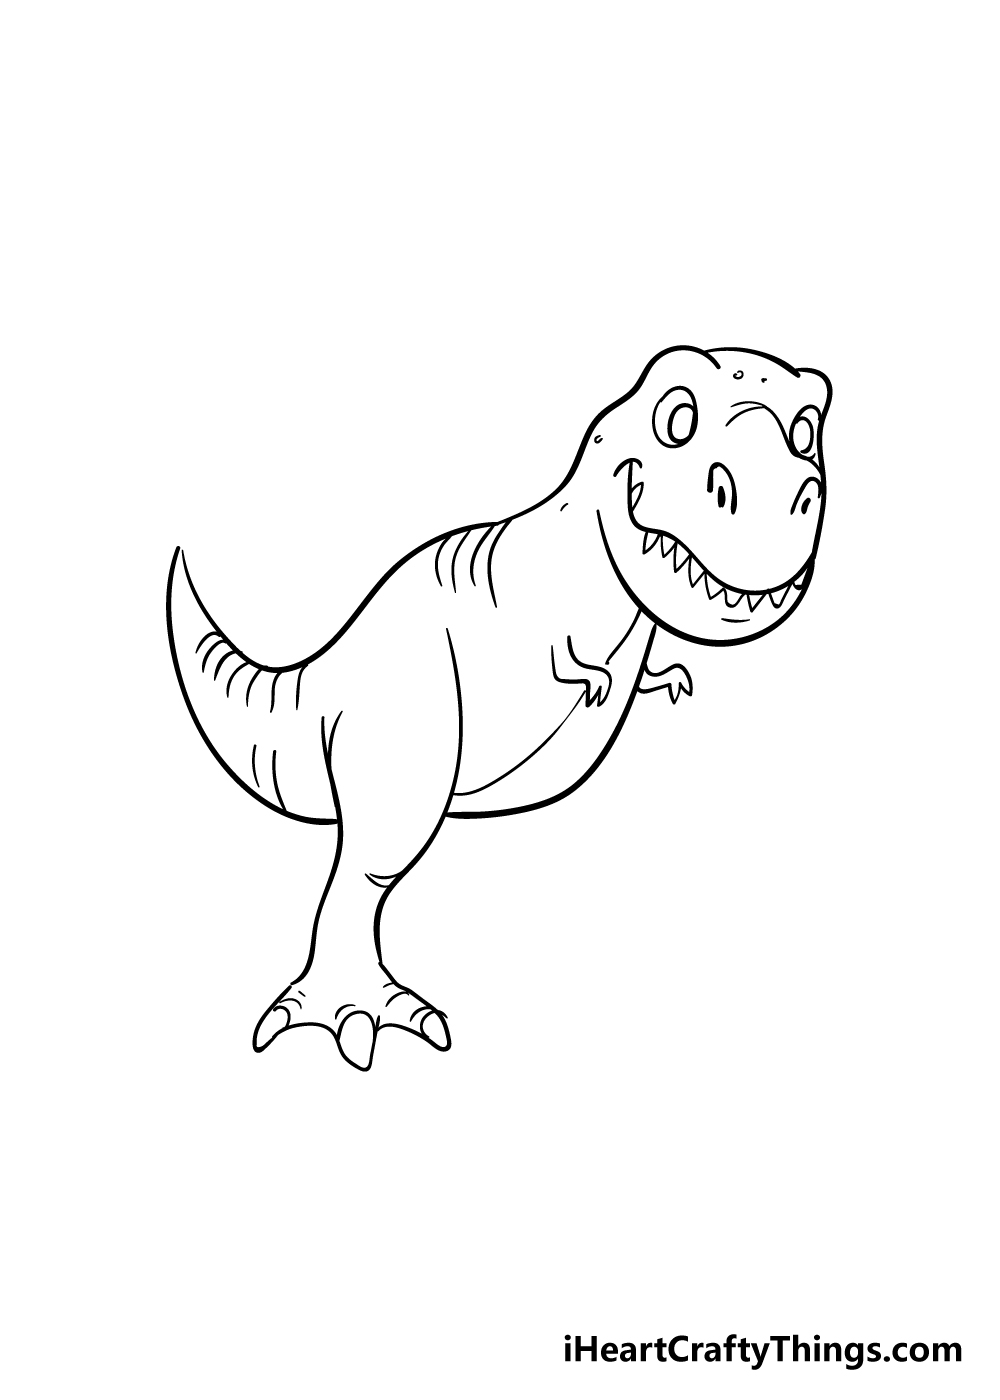 t-rex drawing step 7